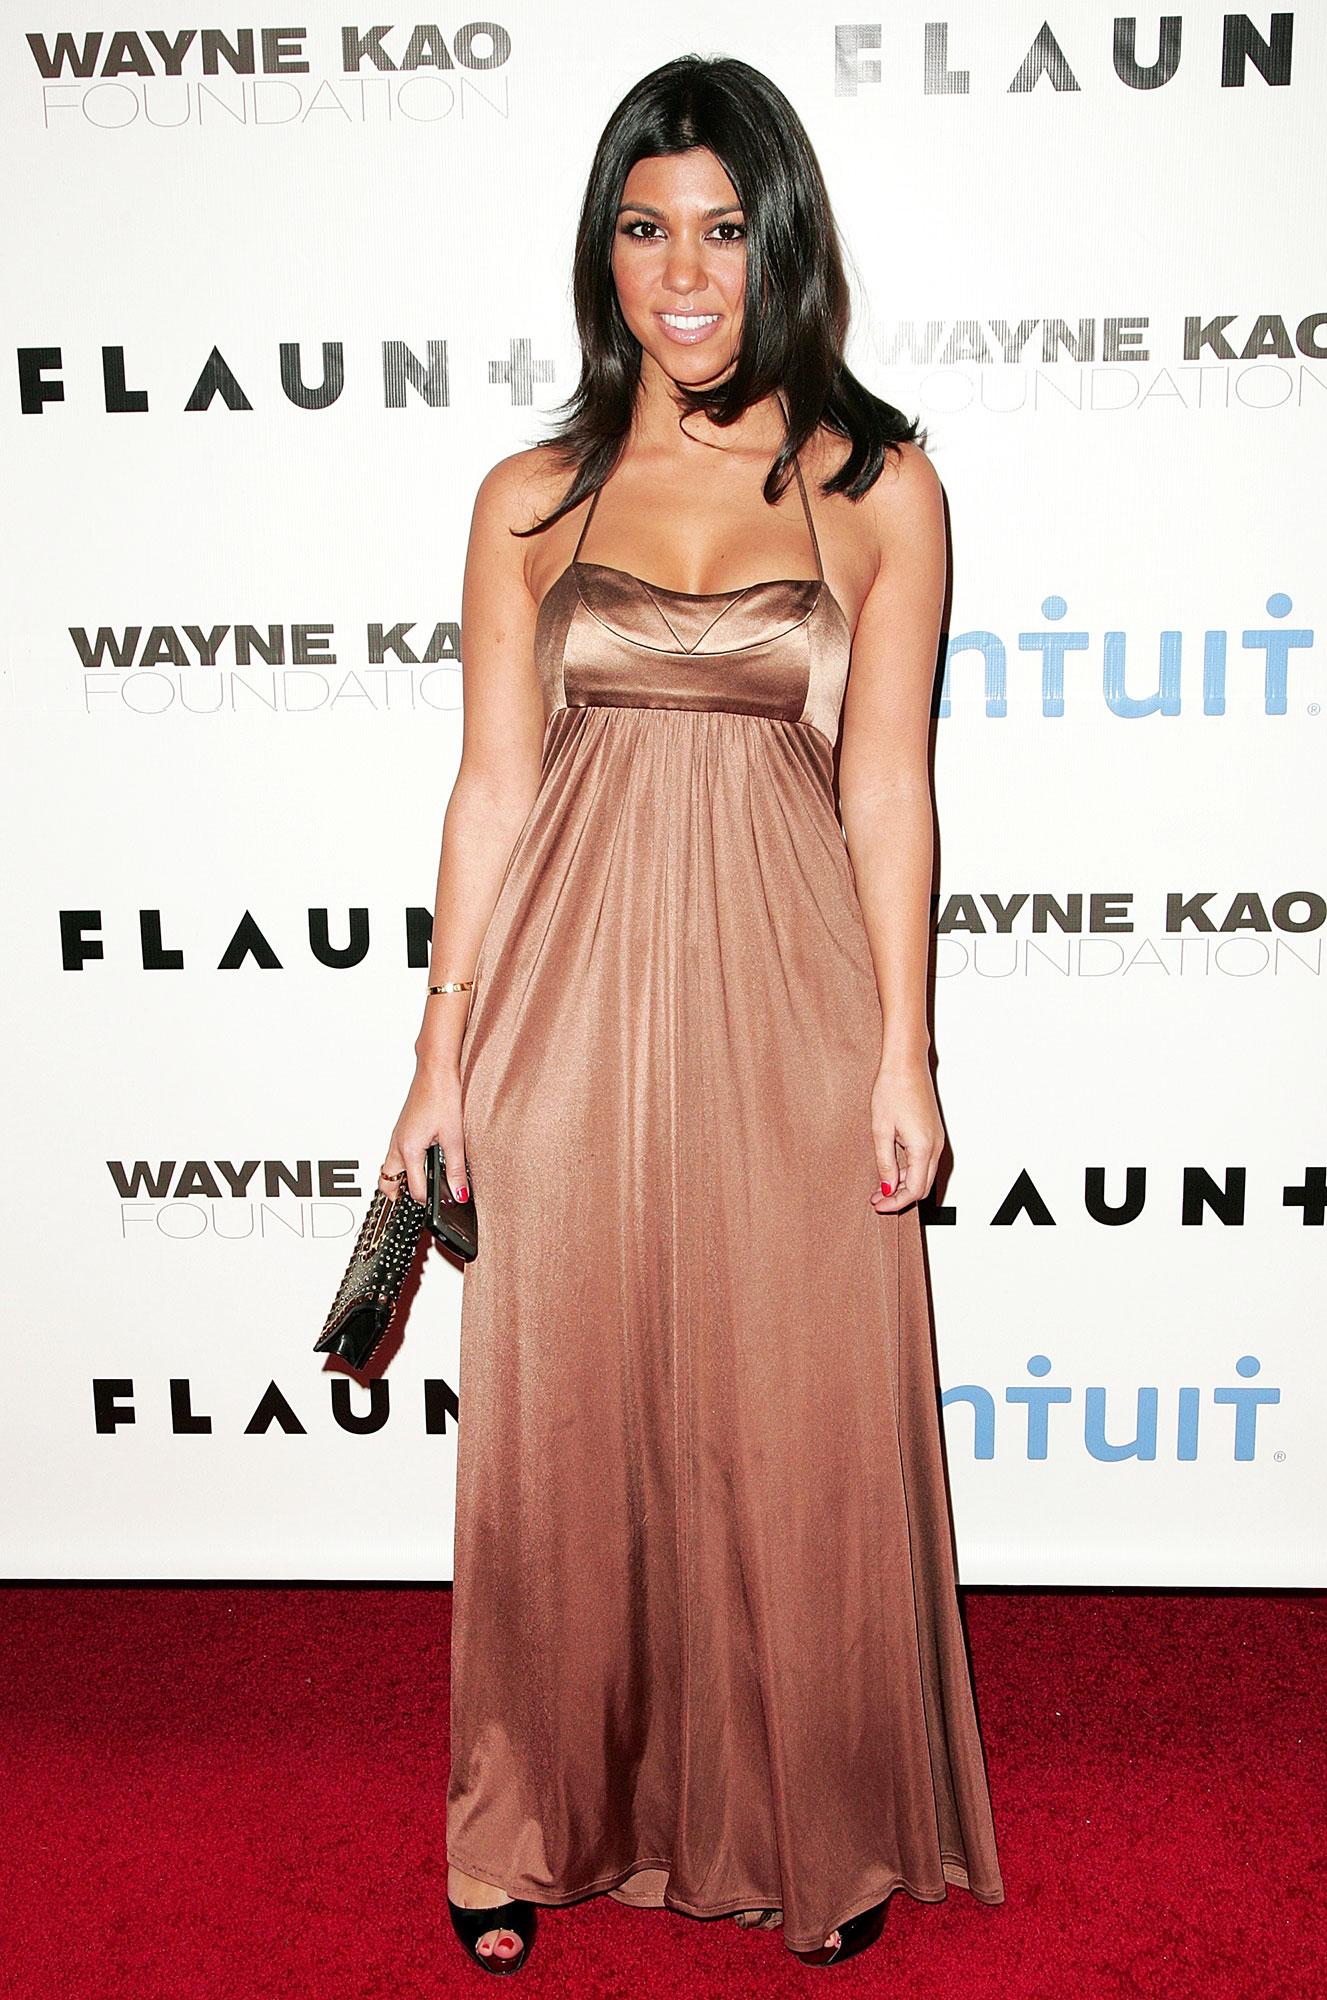 Happy 40th Birthday, Kourtney Kardashian - She was a golden goddess in a bronze Doo Ri empire-waist gown at a Flaunt magazine party.